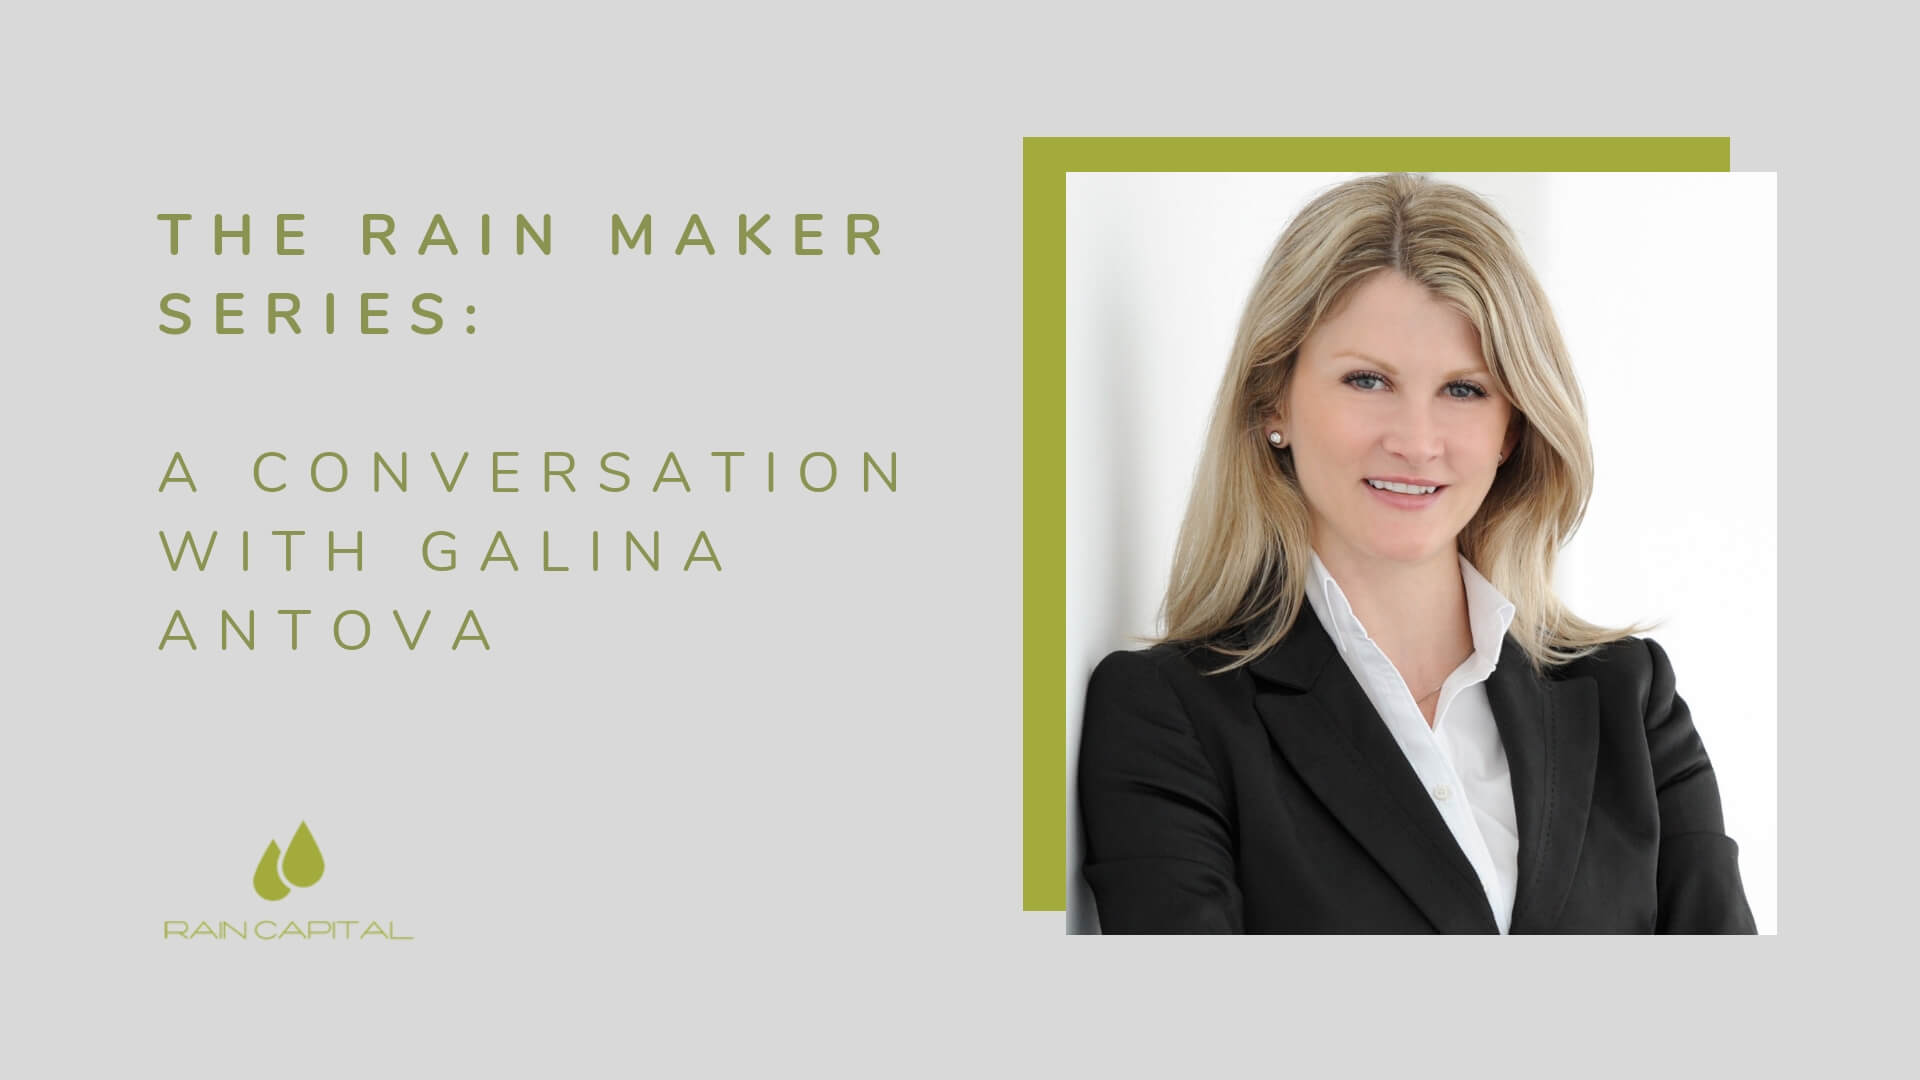 The Rain Maker Series: A Conversation With Galina Antova (Claroty)